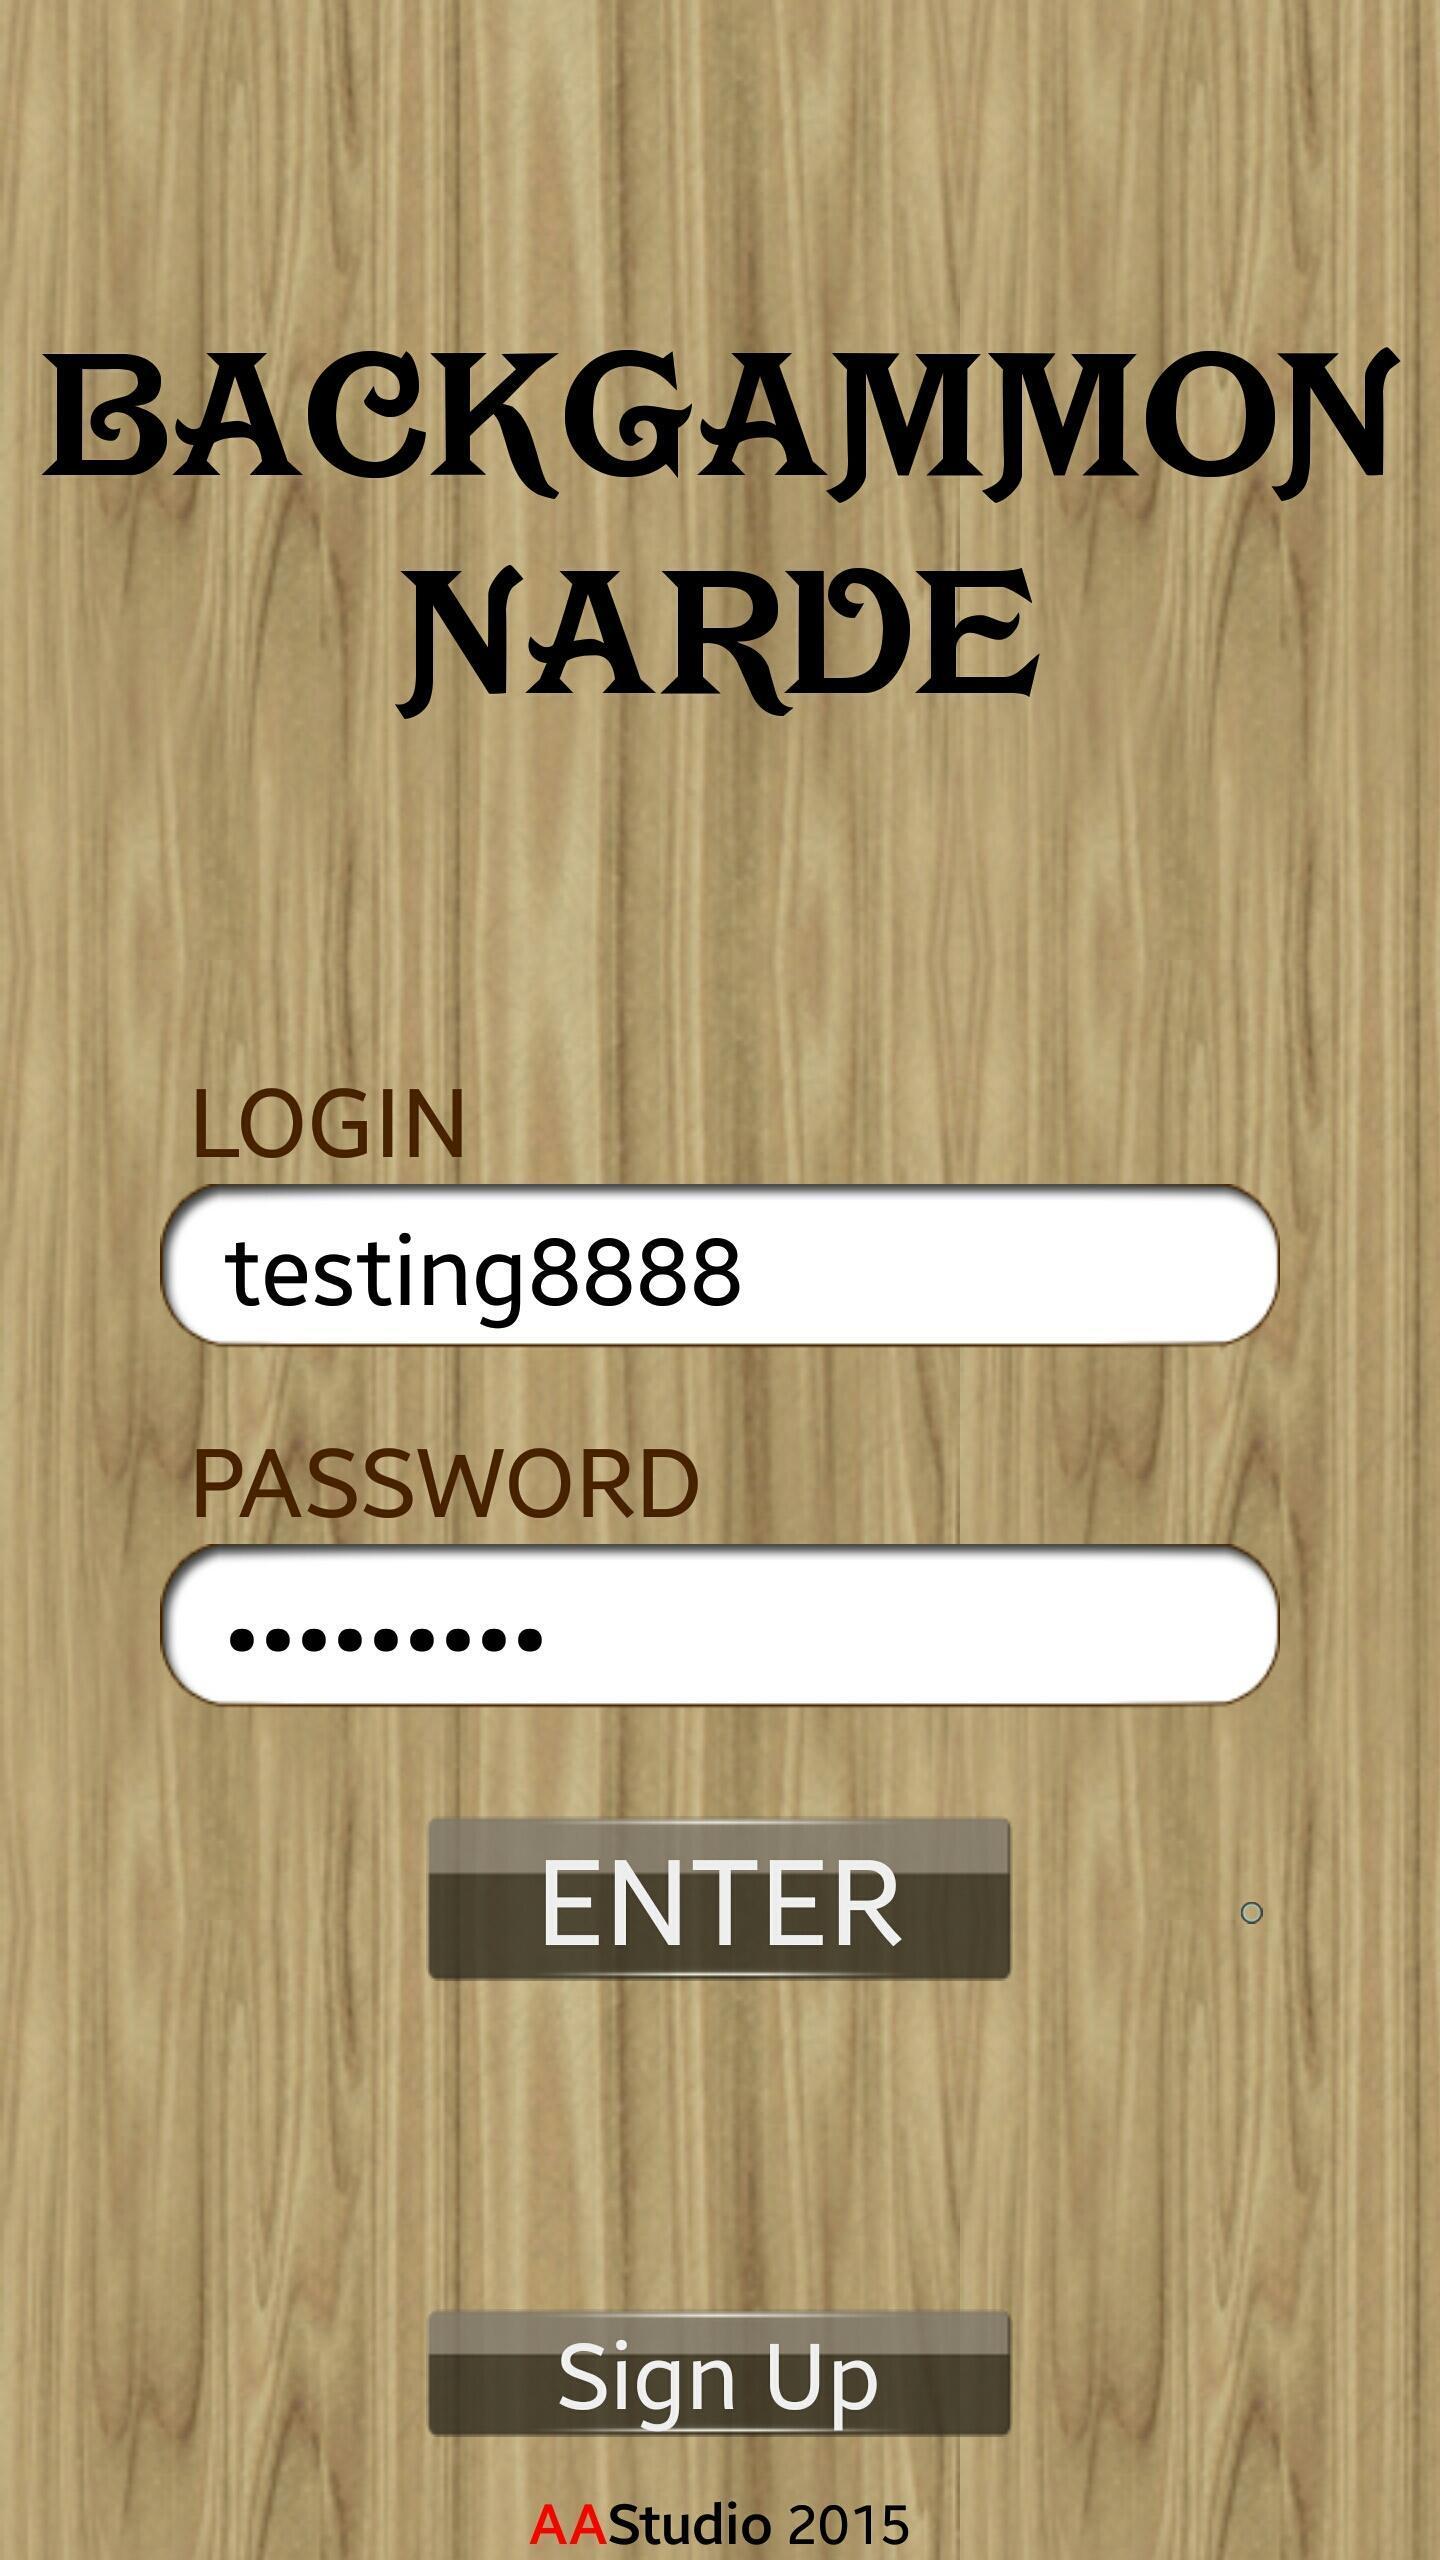 Backgammon - Narde 6.09 Screenshot 2